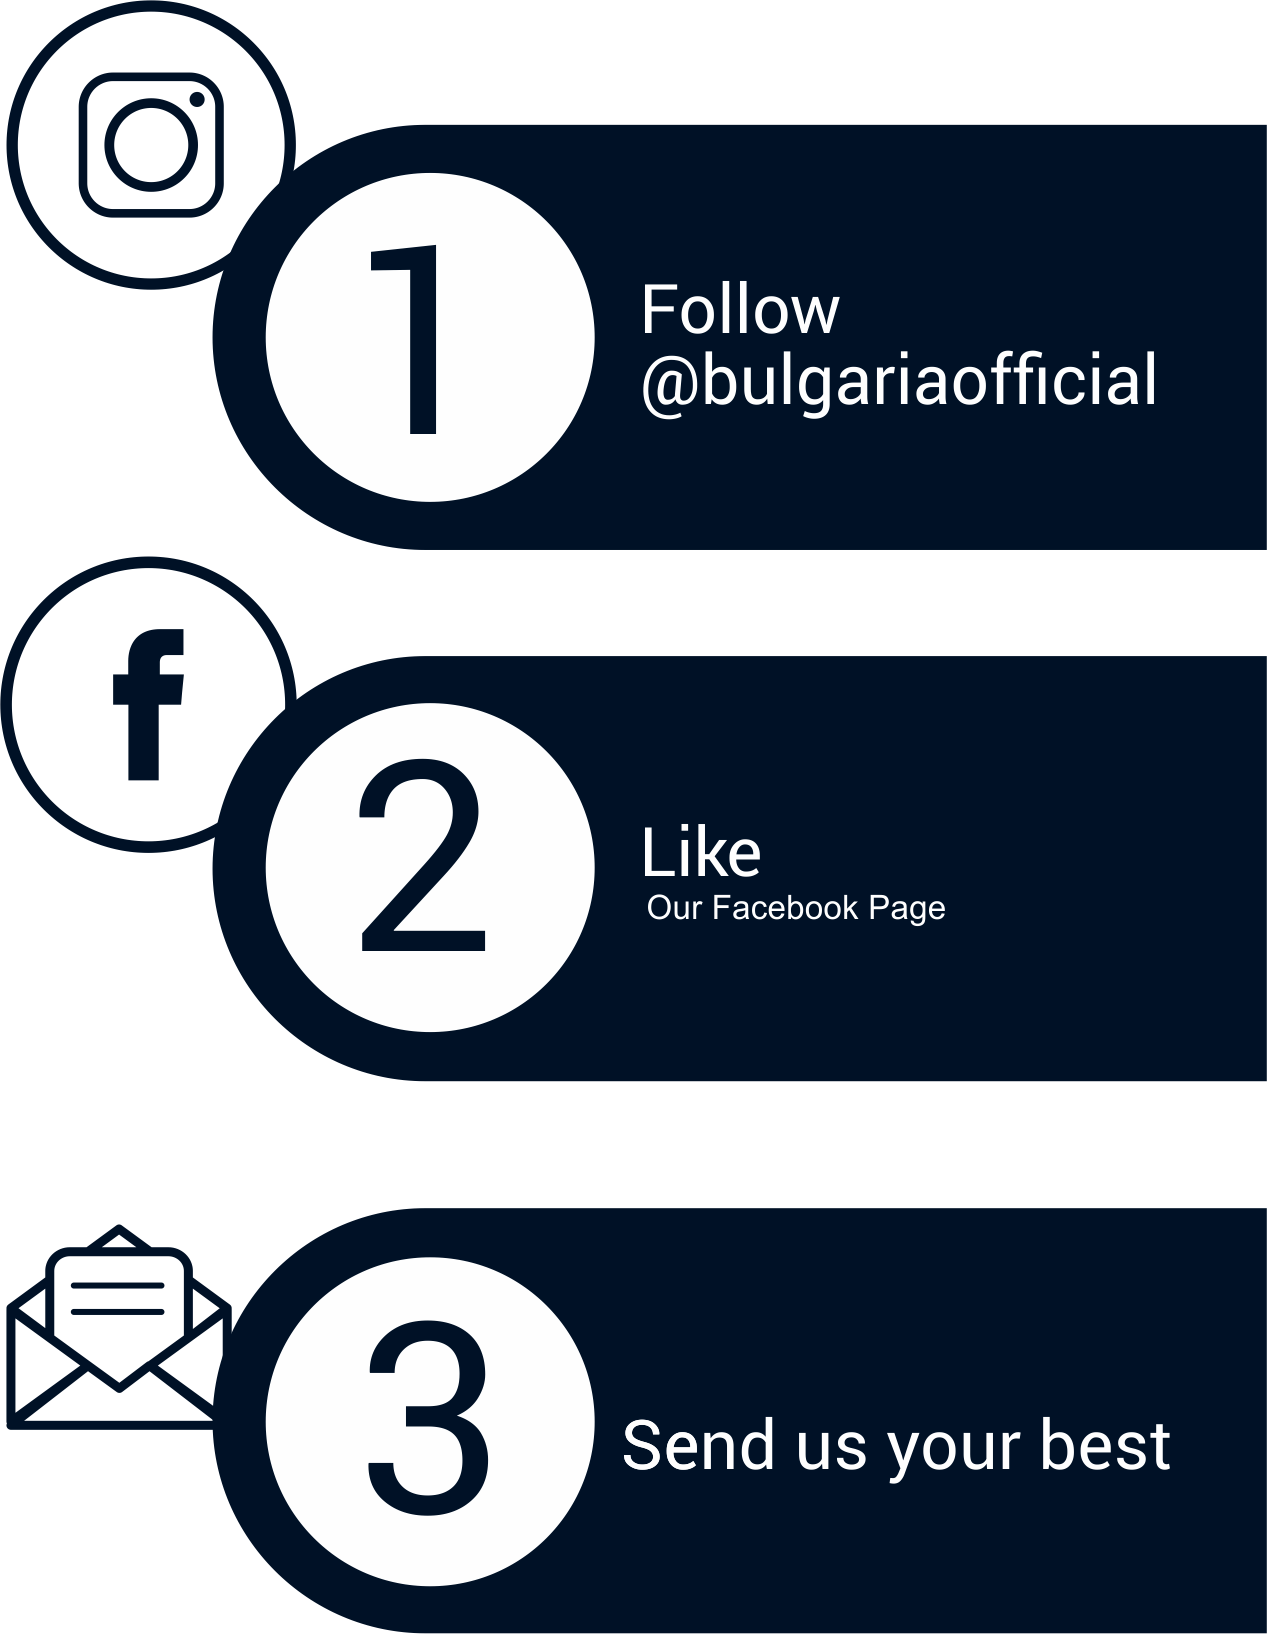 contest6-2018-2019-bulgaria-official